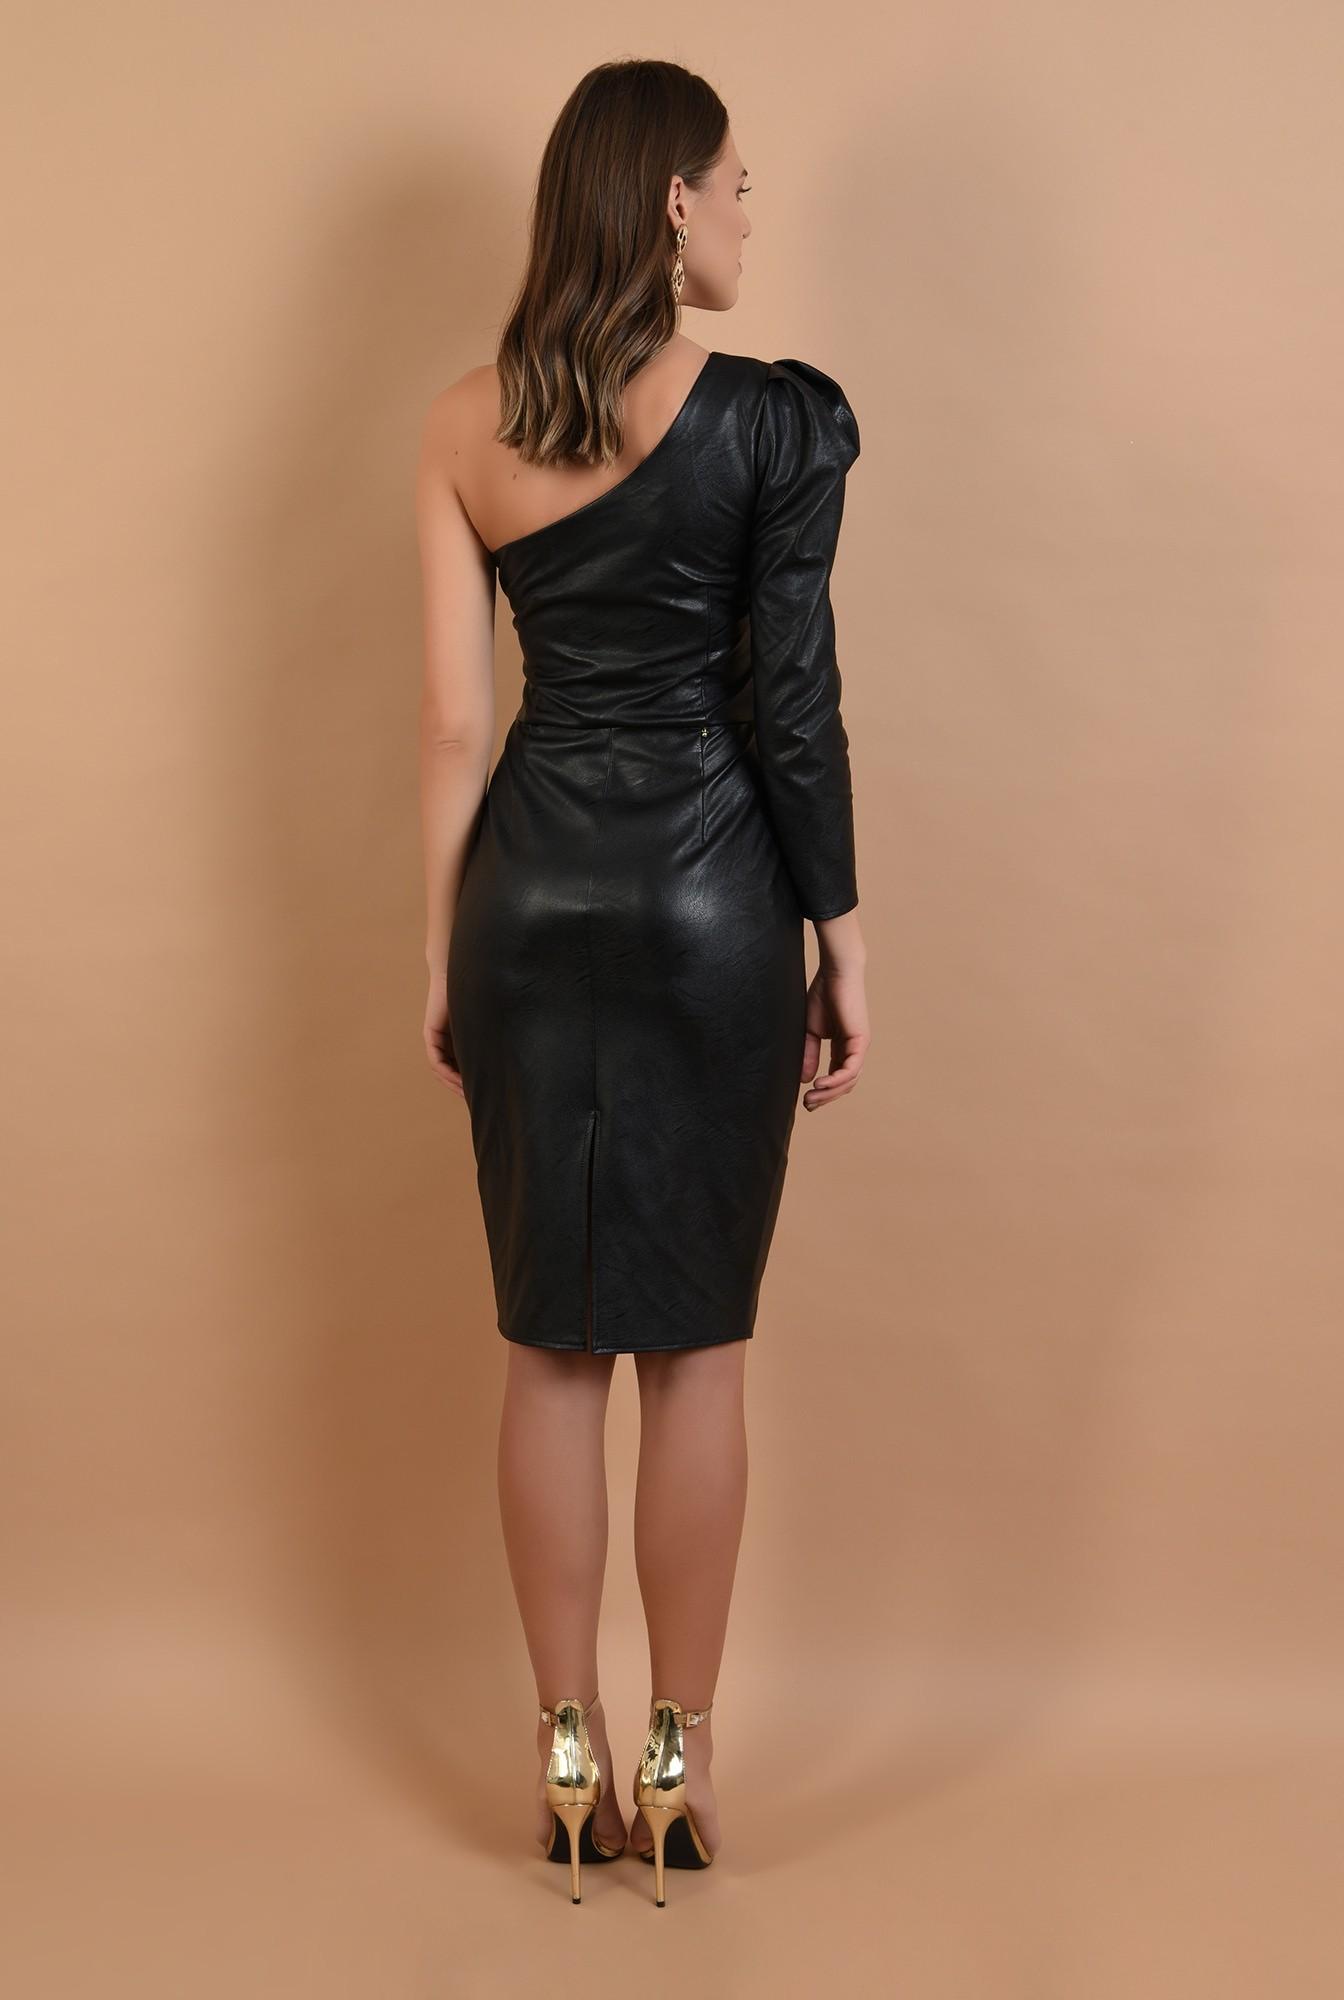 1 - rochie eleganta, piele neagra, maneca drapata, umar gol